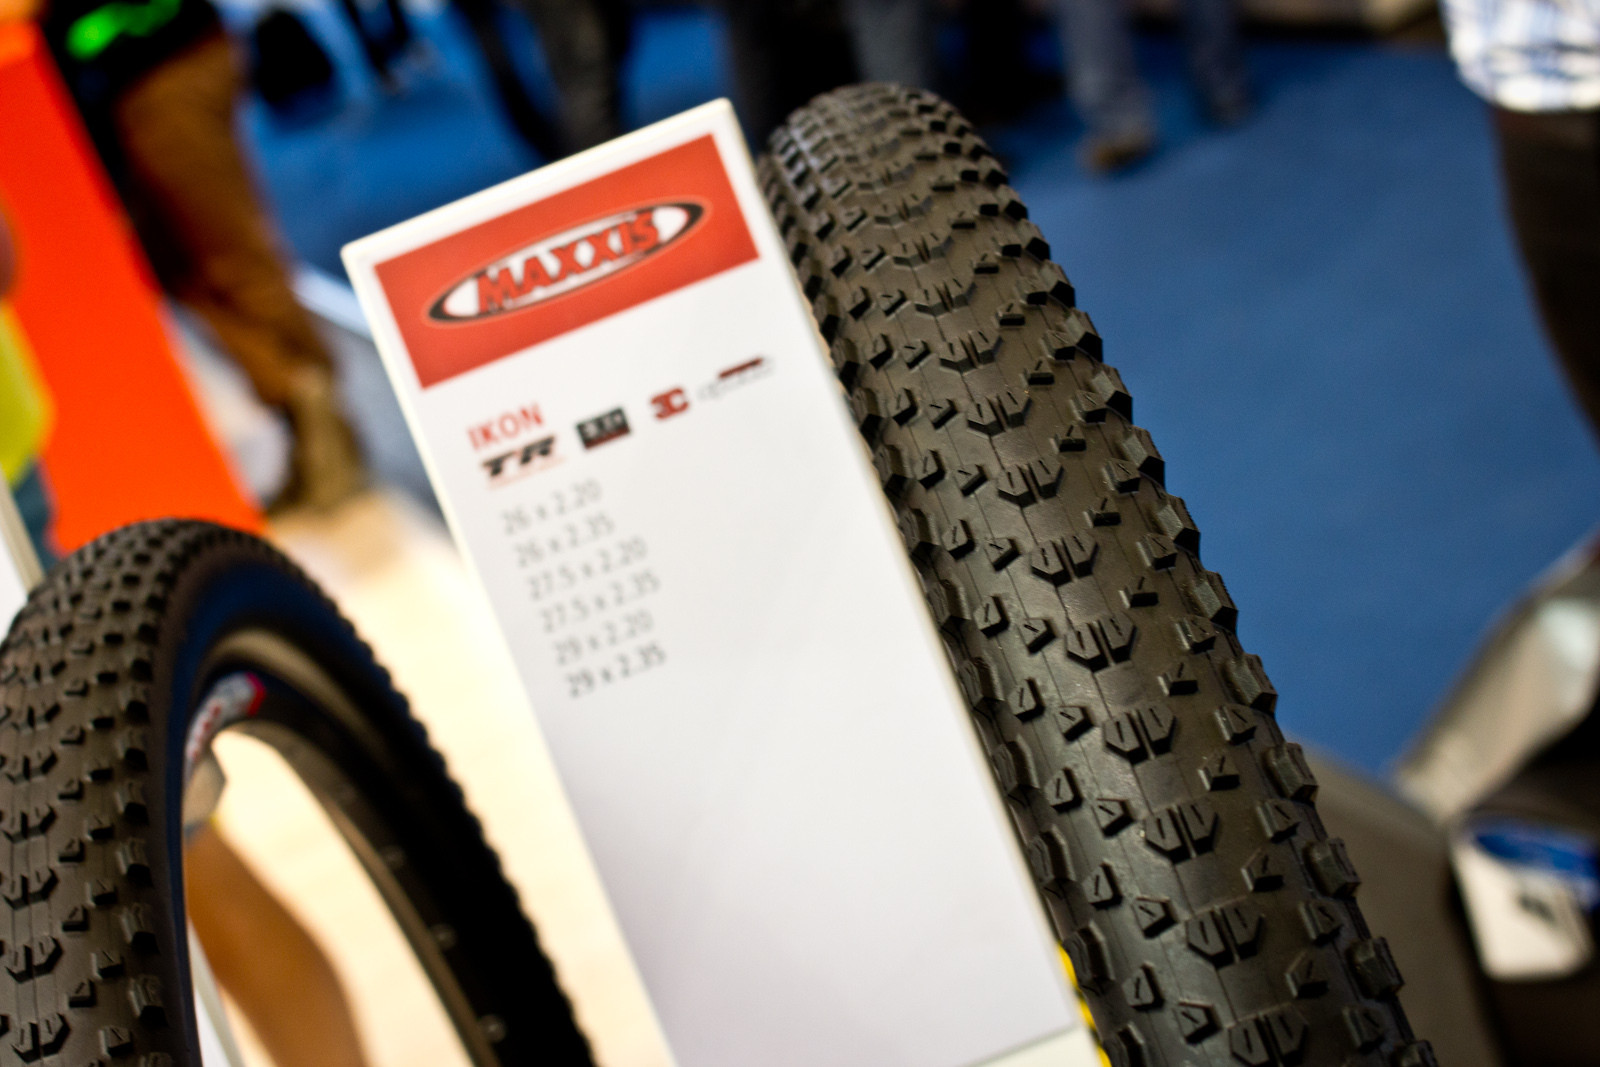 Maxxis Ikon in 29x2.35 - 2014 Mountain Bike Components at Eurobike 2013 - Mountain Biking Pictures - Vital MTB